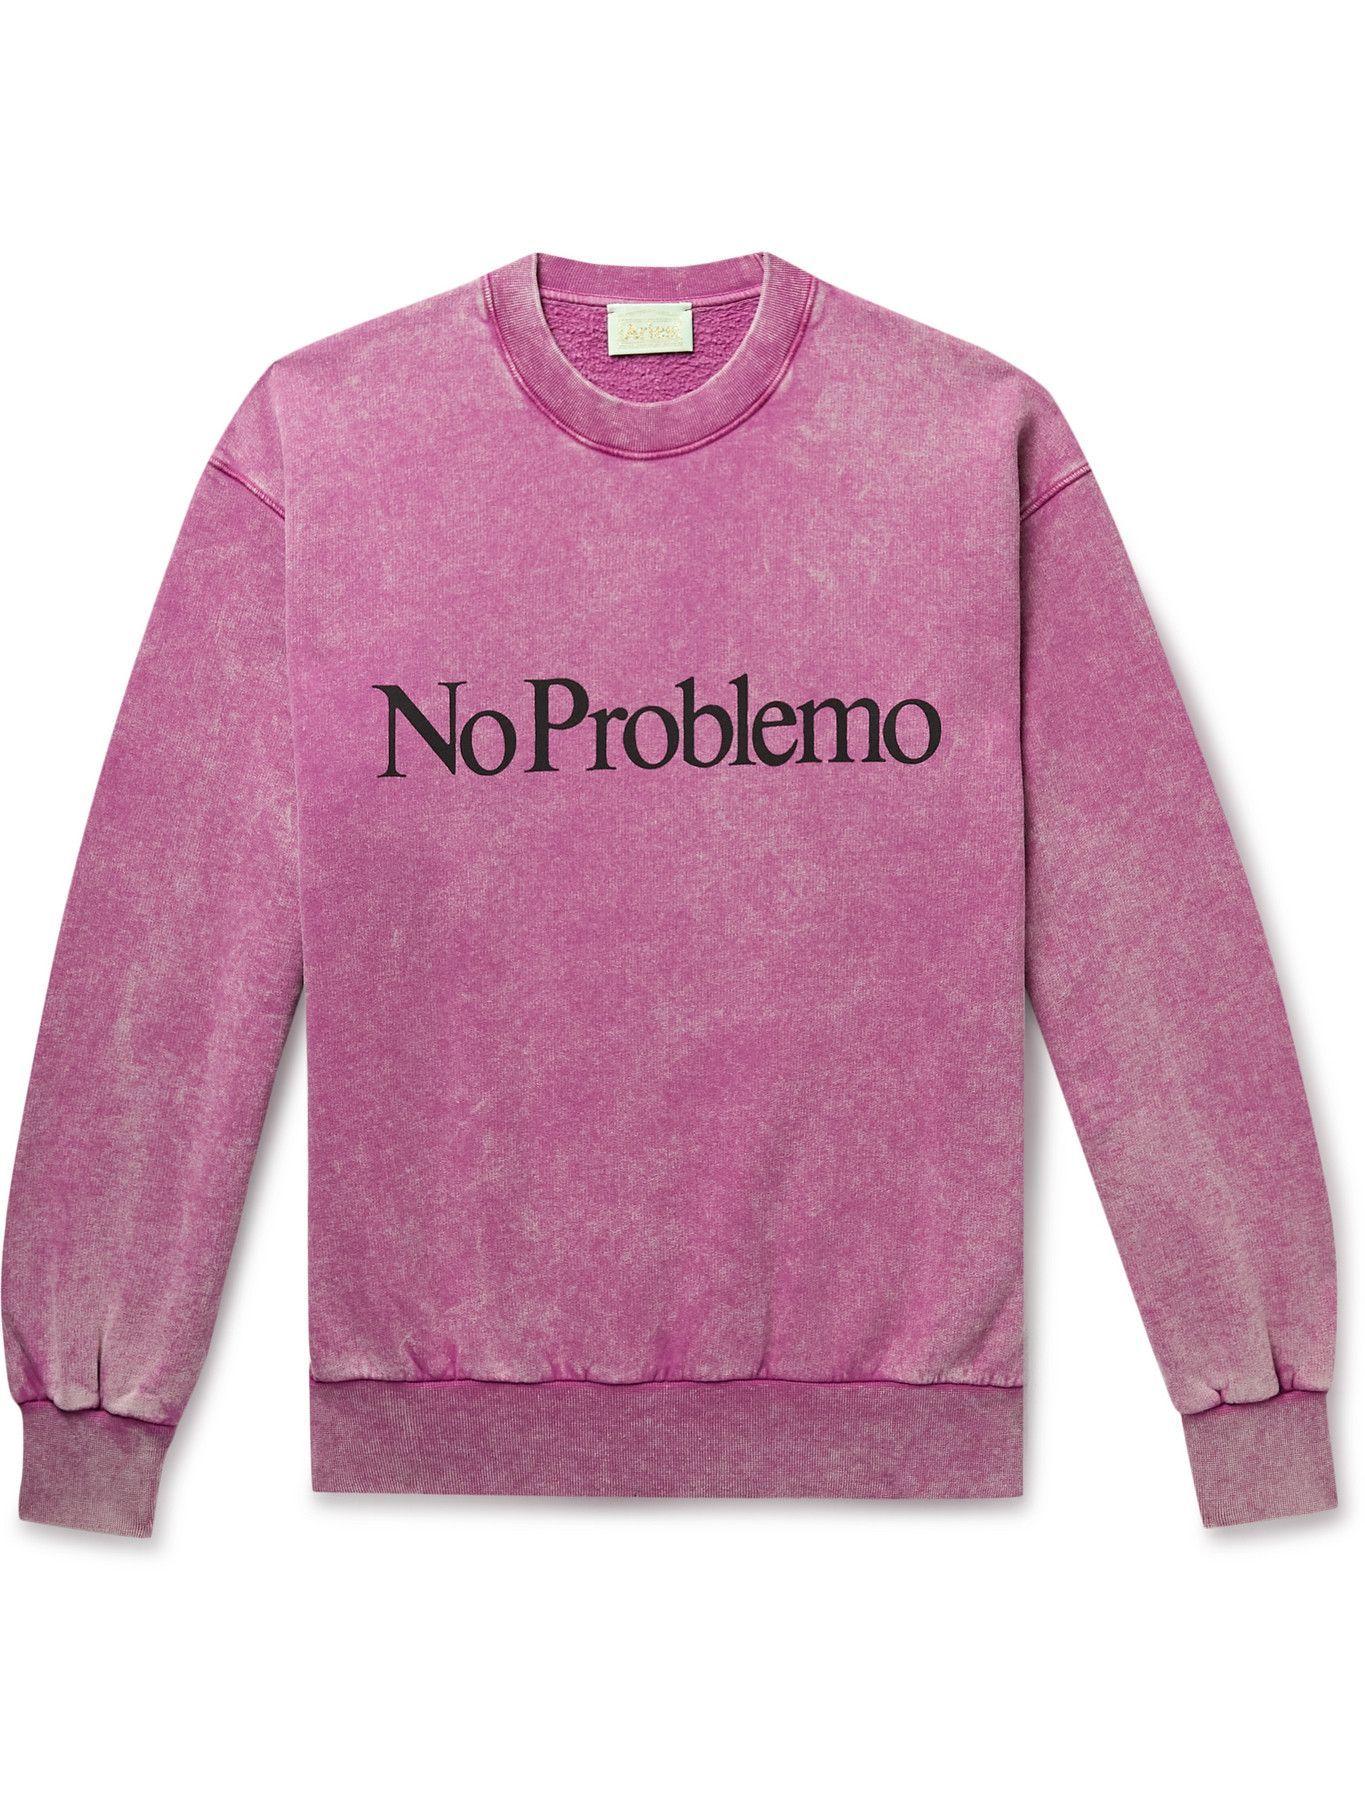 Photo: Aries - No Problemo Acid-Washed Cotton-Jersey Sweatshirt - Pink